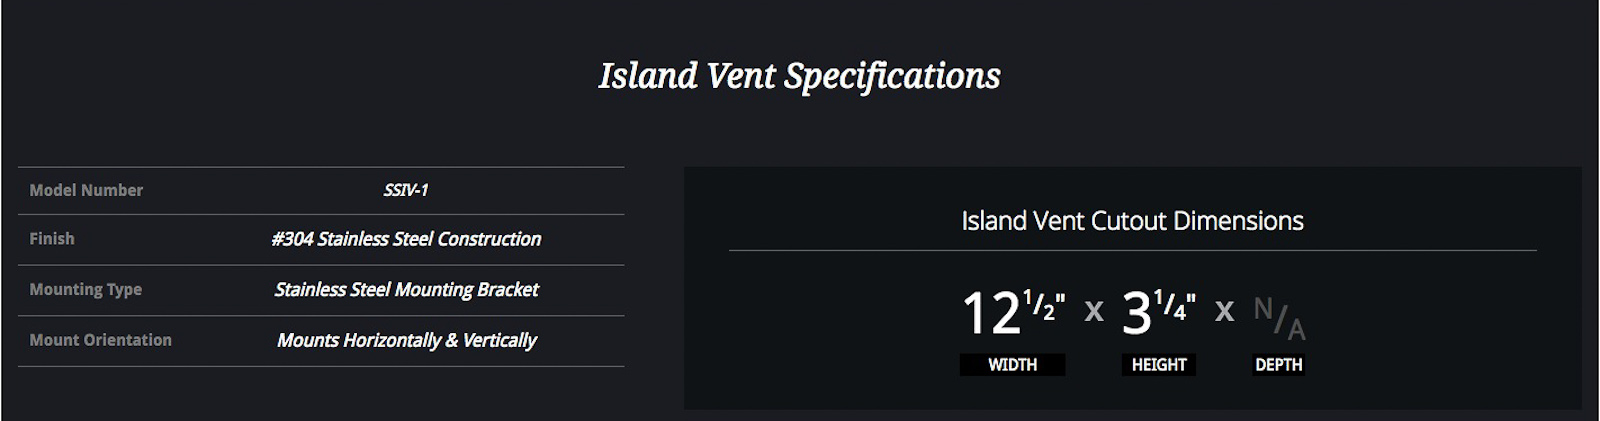 summerset-island-vent-ssiv-1.jpg